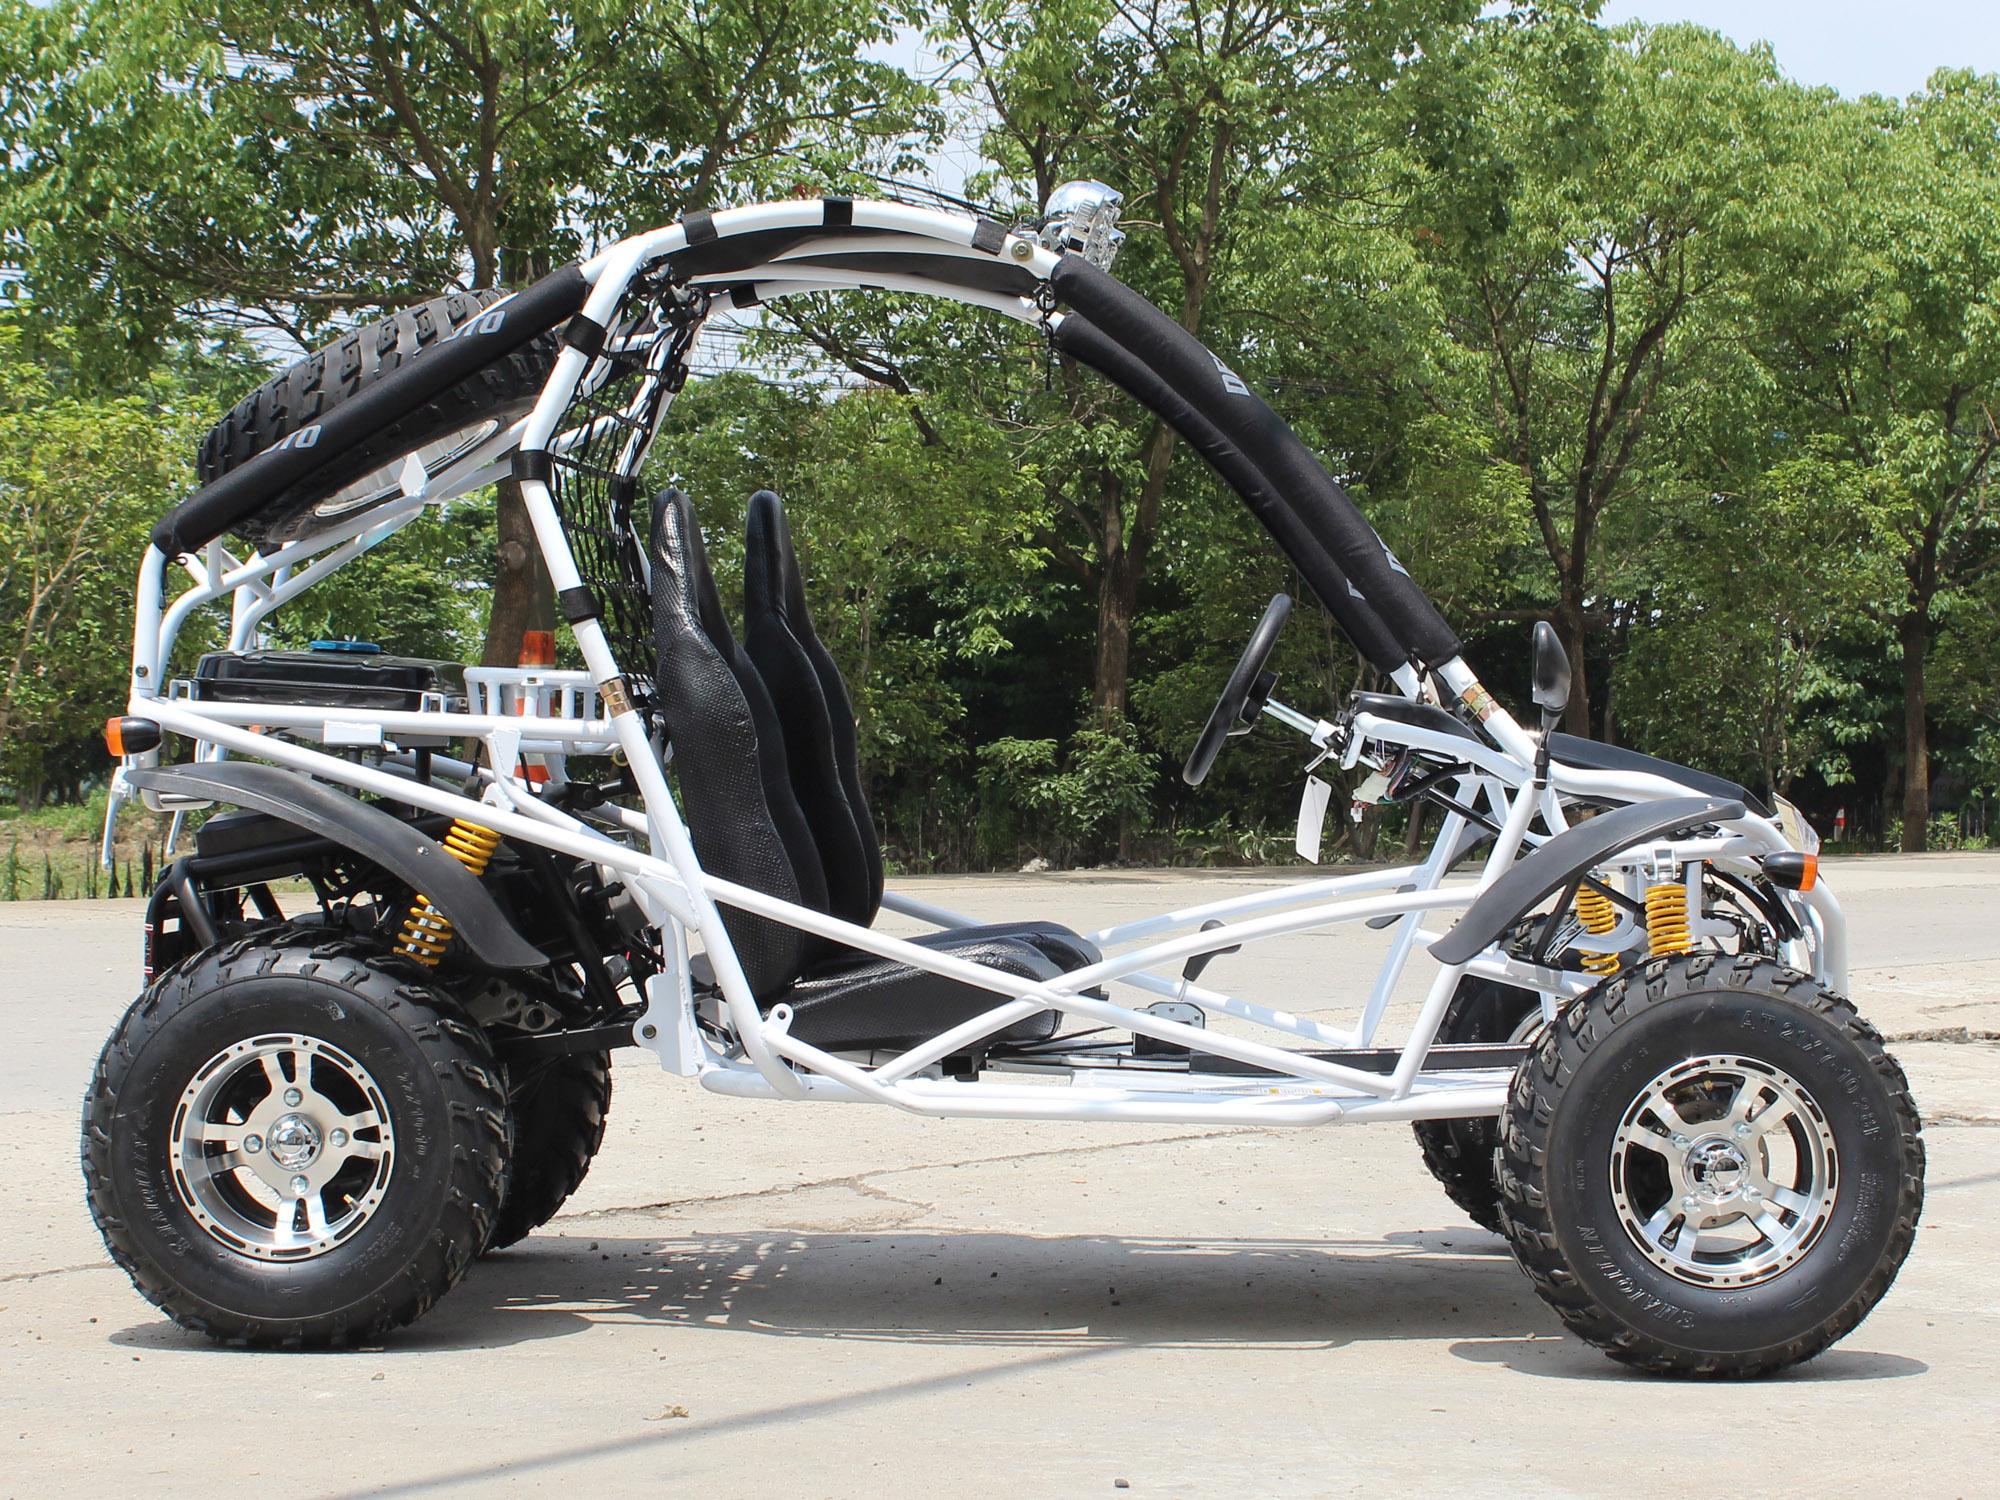 DF MOTO Jaguar 200cc 2 Seat Go Kart Buggy